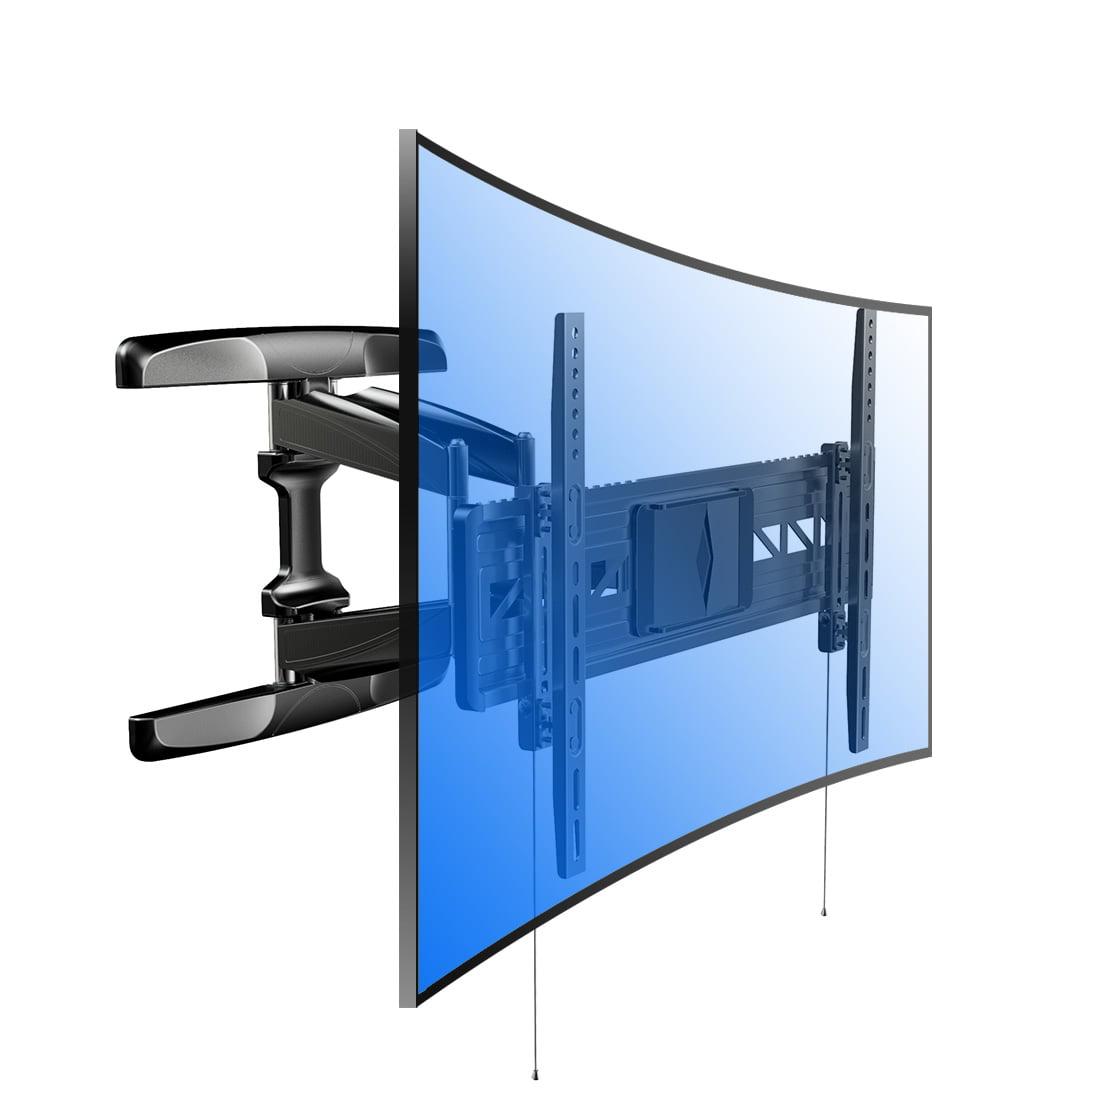 "Loctek R2 Curved Panel UHD HD TV Wall Mount Bracket Articulating Arm Swivel & Tilt for 32""-70"" 4K HD... by LOCTEK"